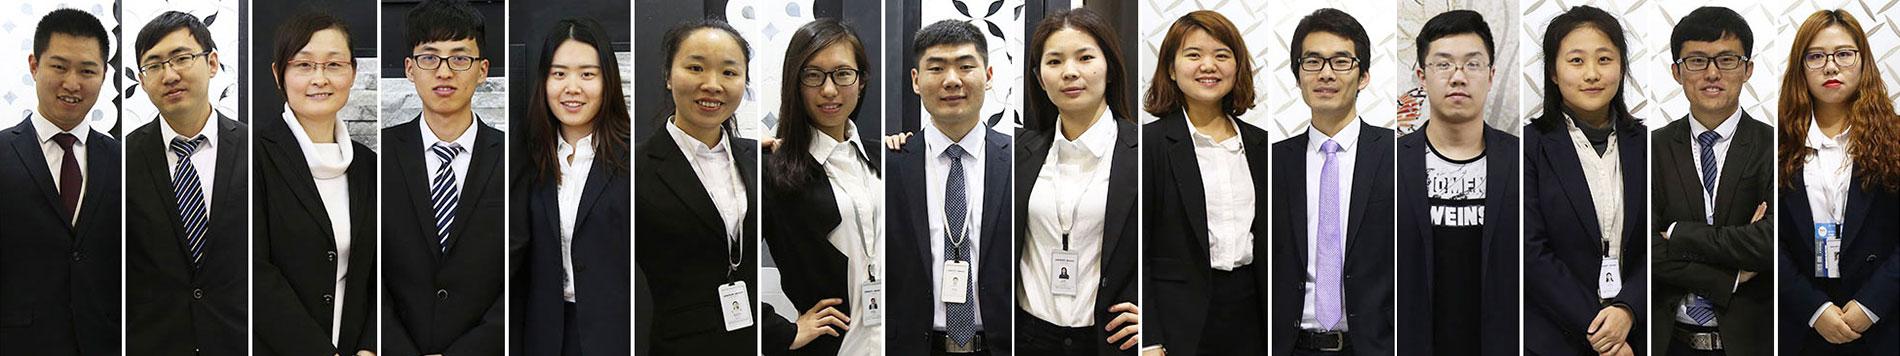 centurymosaic-service-team